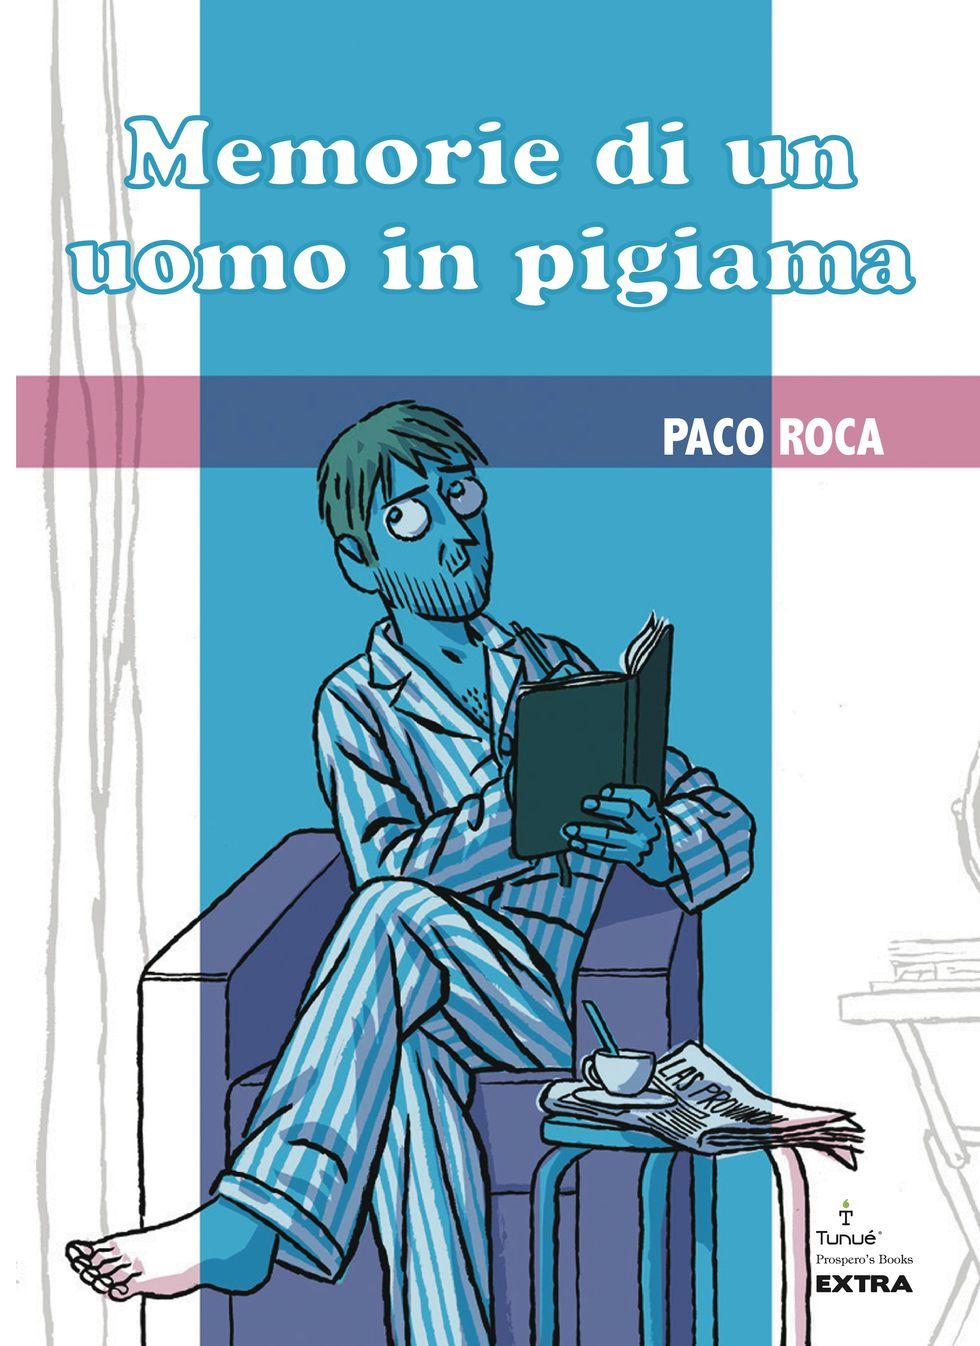 Memorie di un uomo in pigiama di Paco Roca